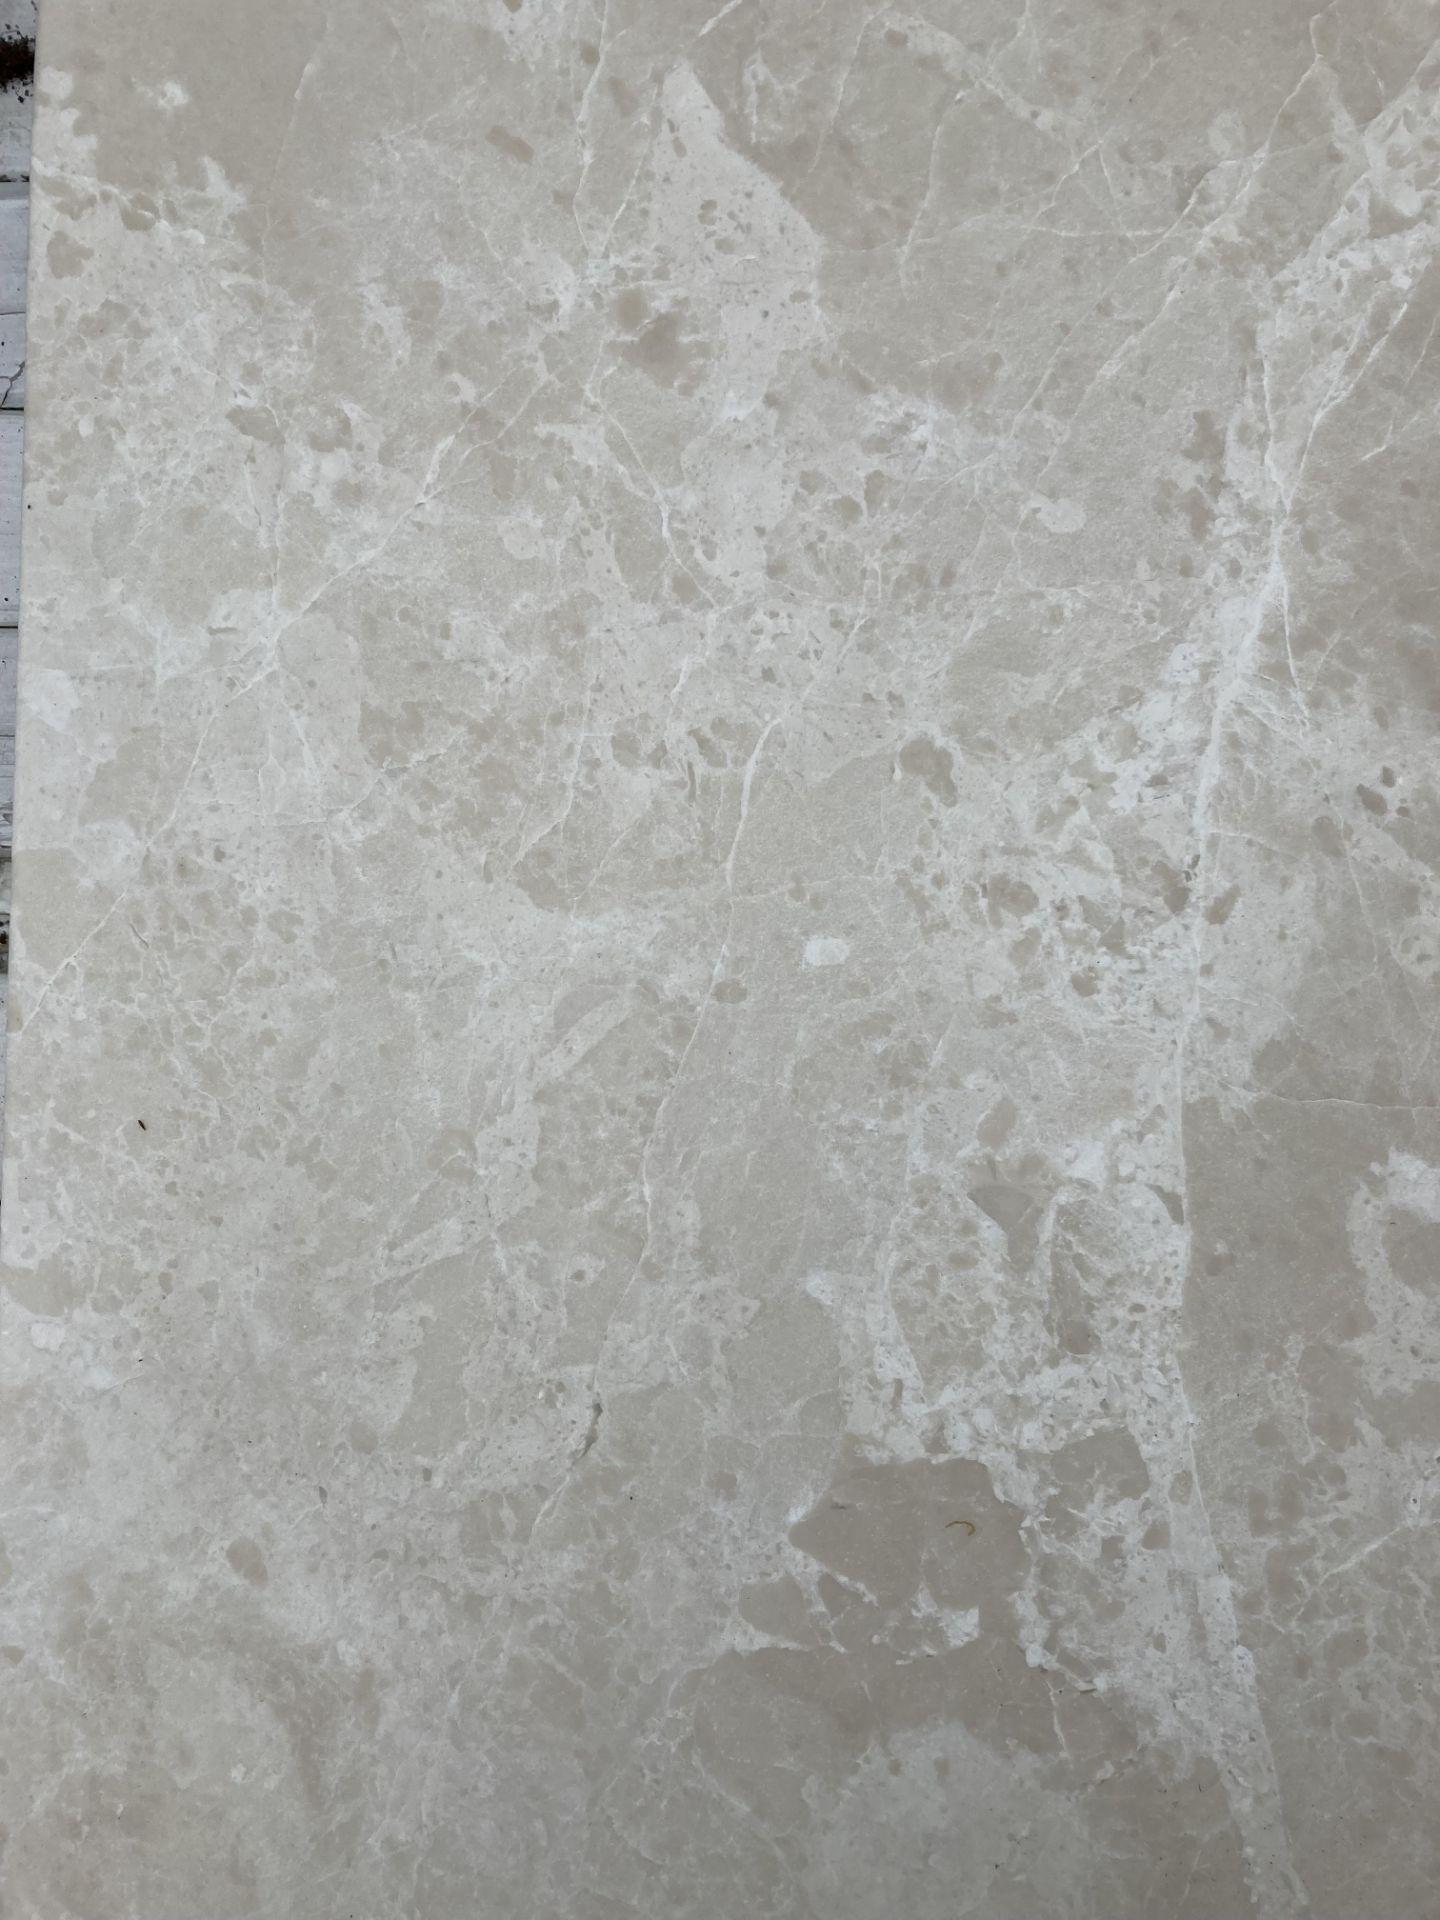 40 x packs of 4 marble tiles in Rosoni beige - 30 x 60 x 1. - Image 2 of 3